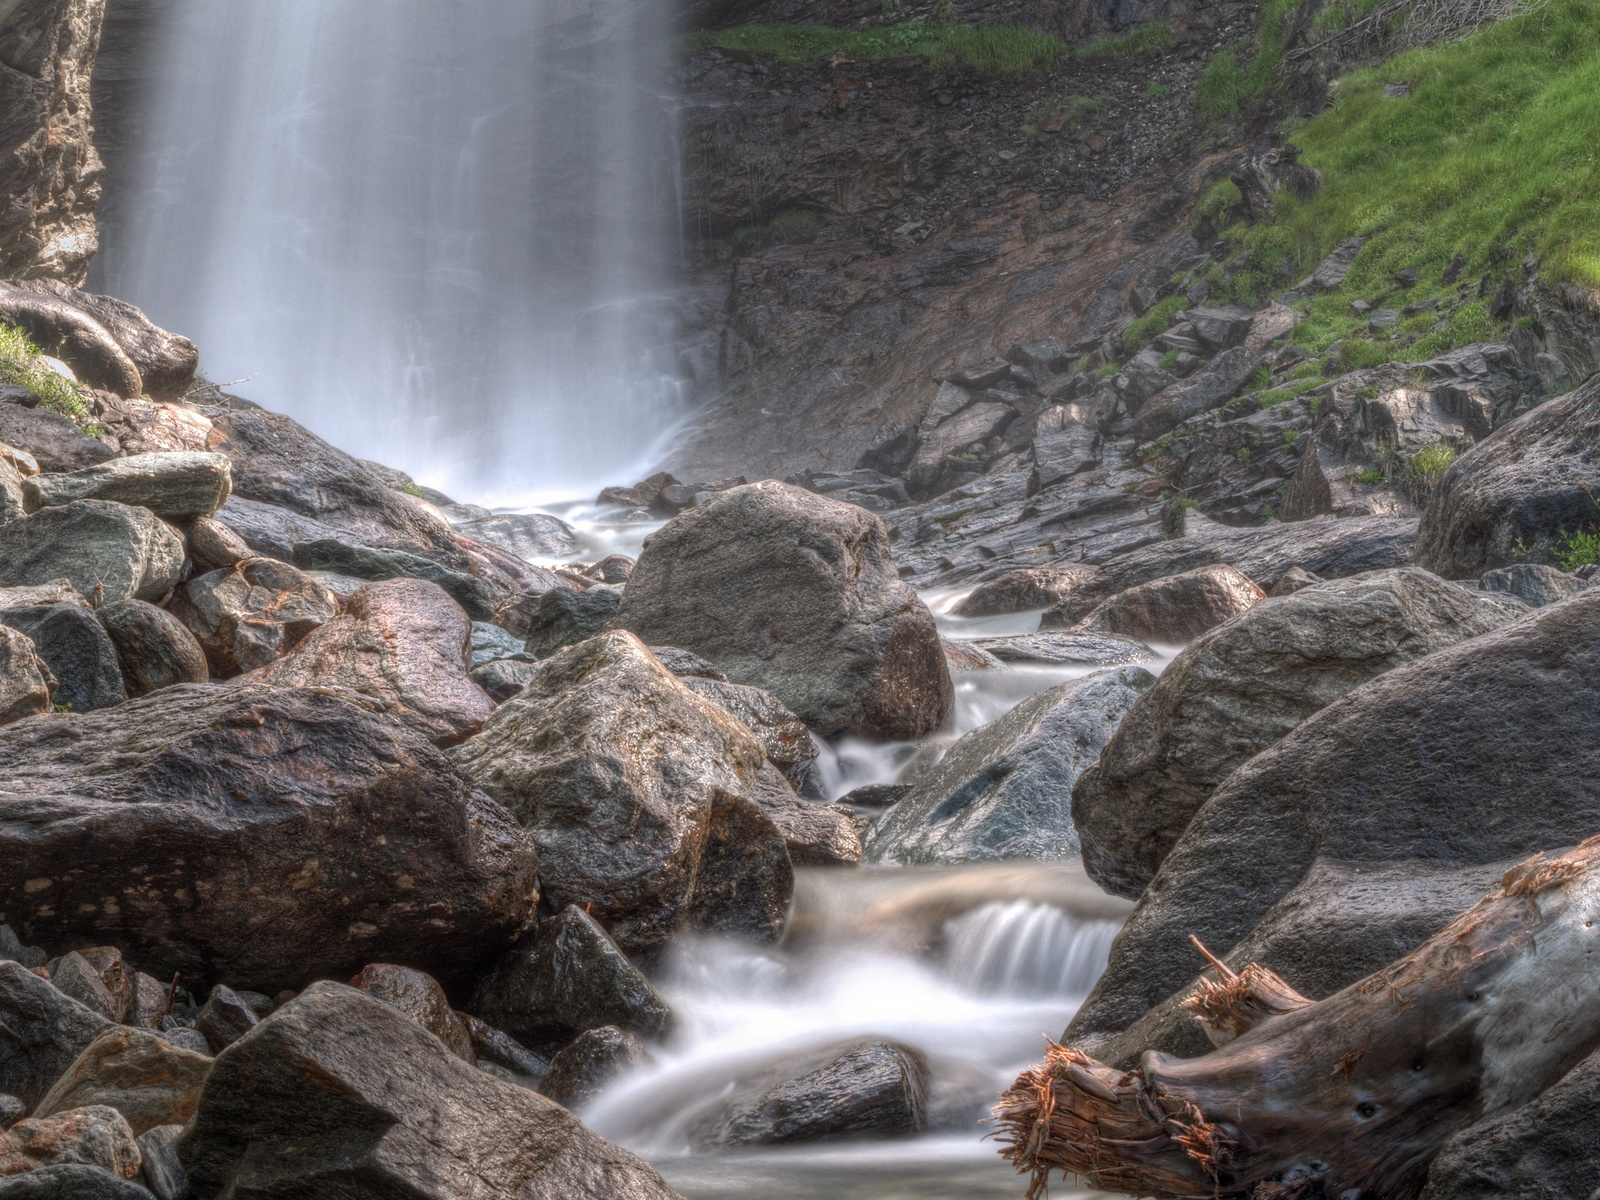 камни, ручей, водопад